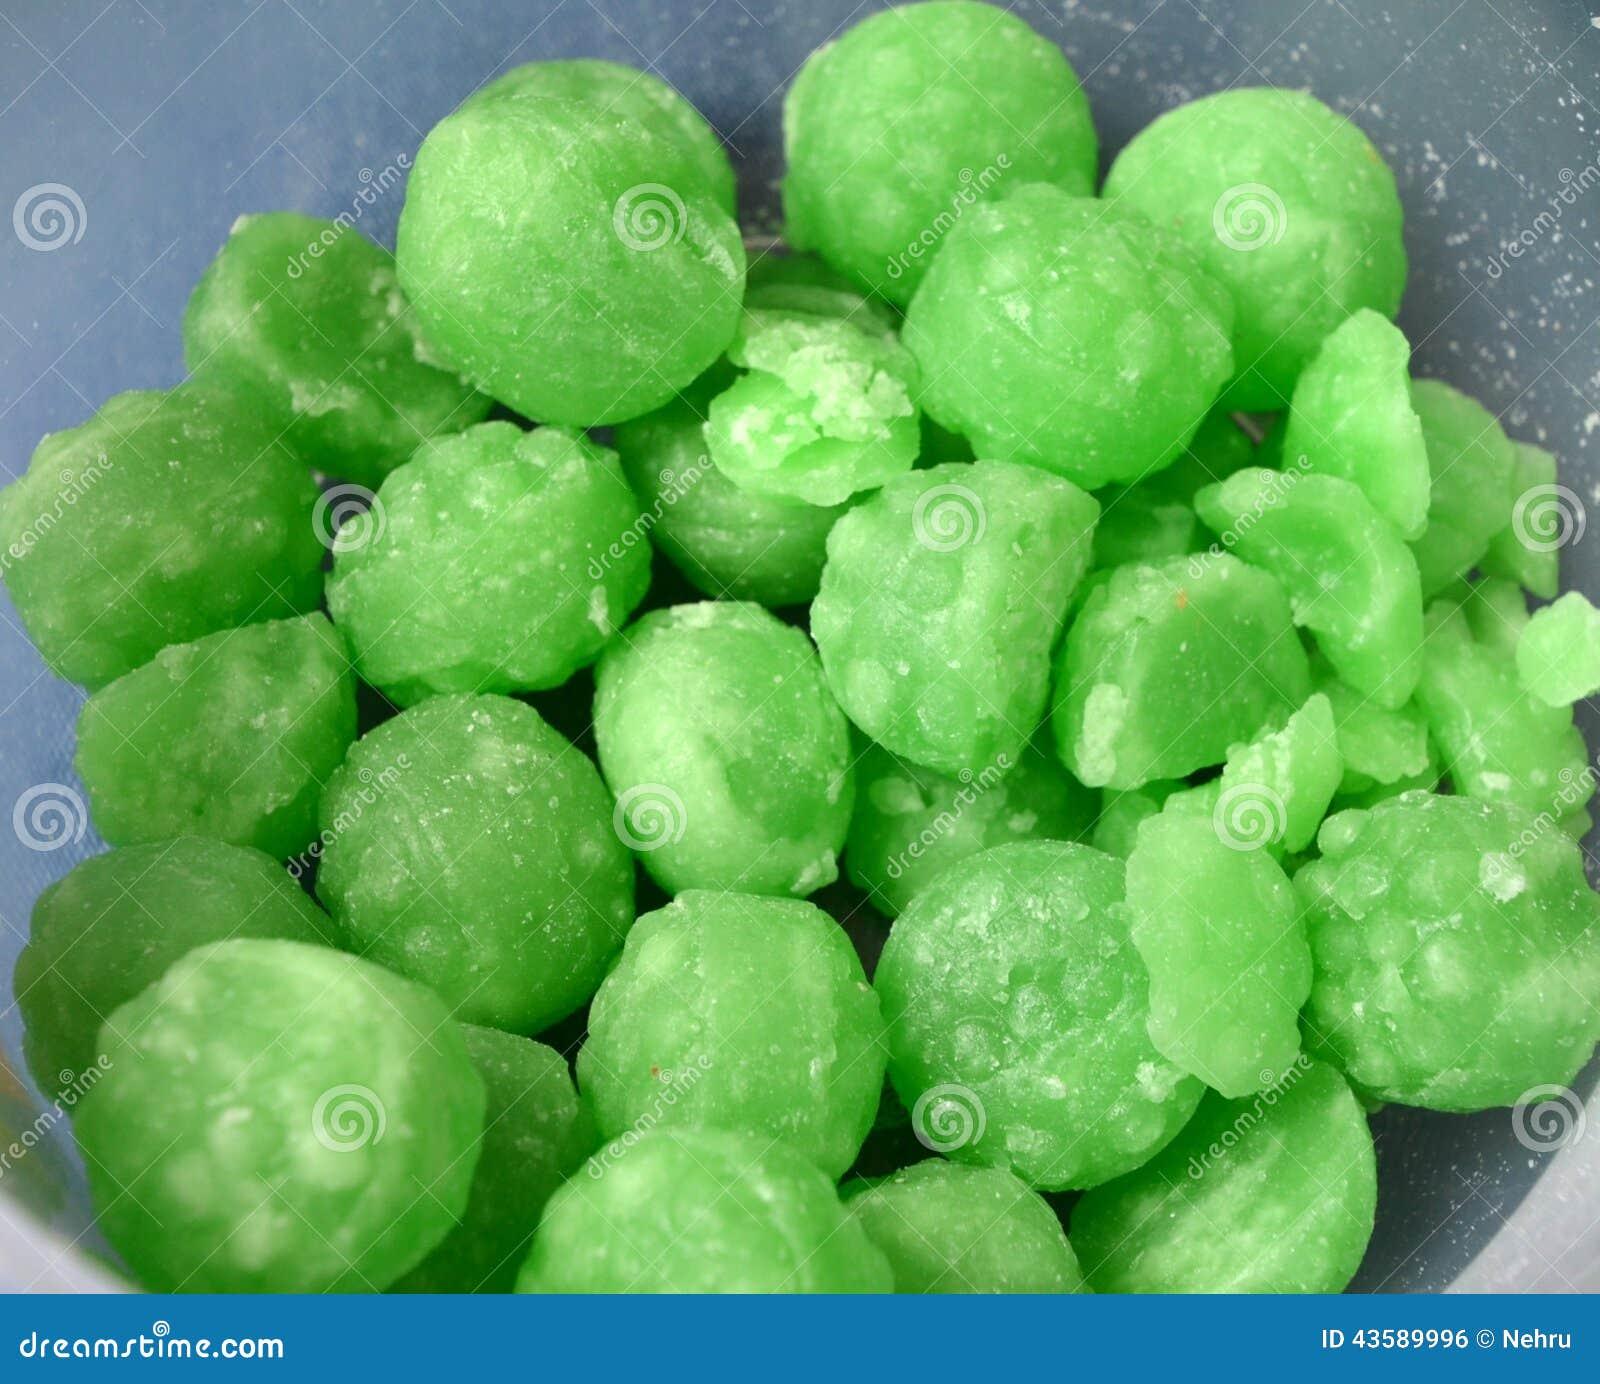 Caramelos de menta verdes foto de archivo. Imagen de niñez - 43589996